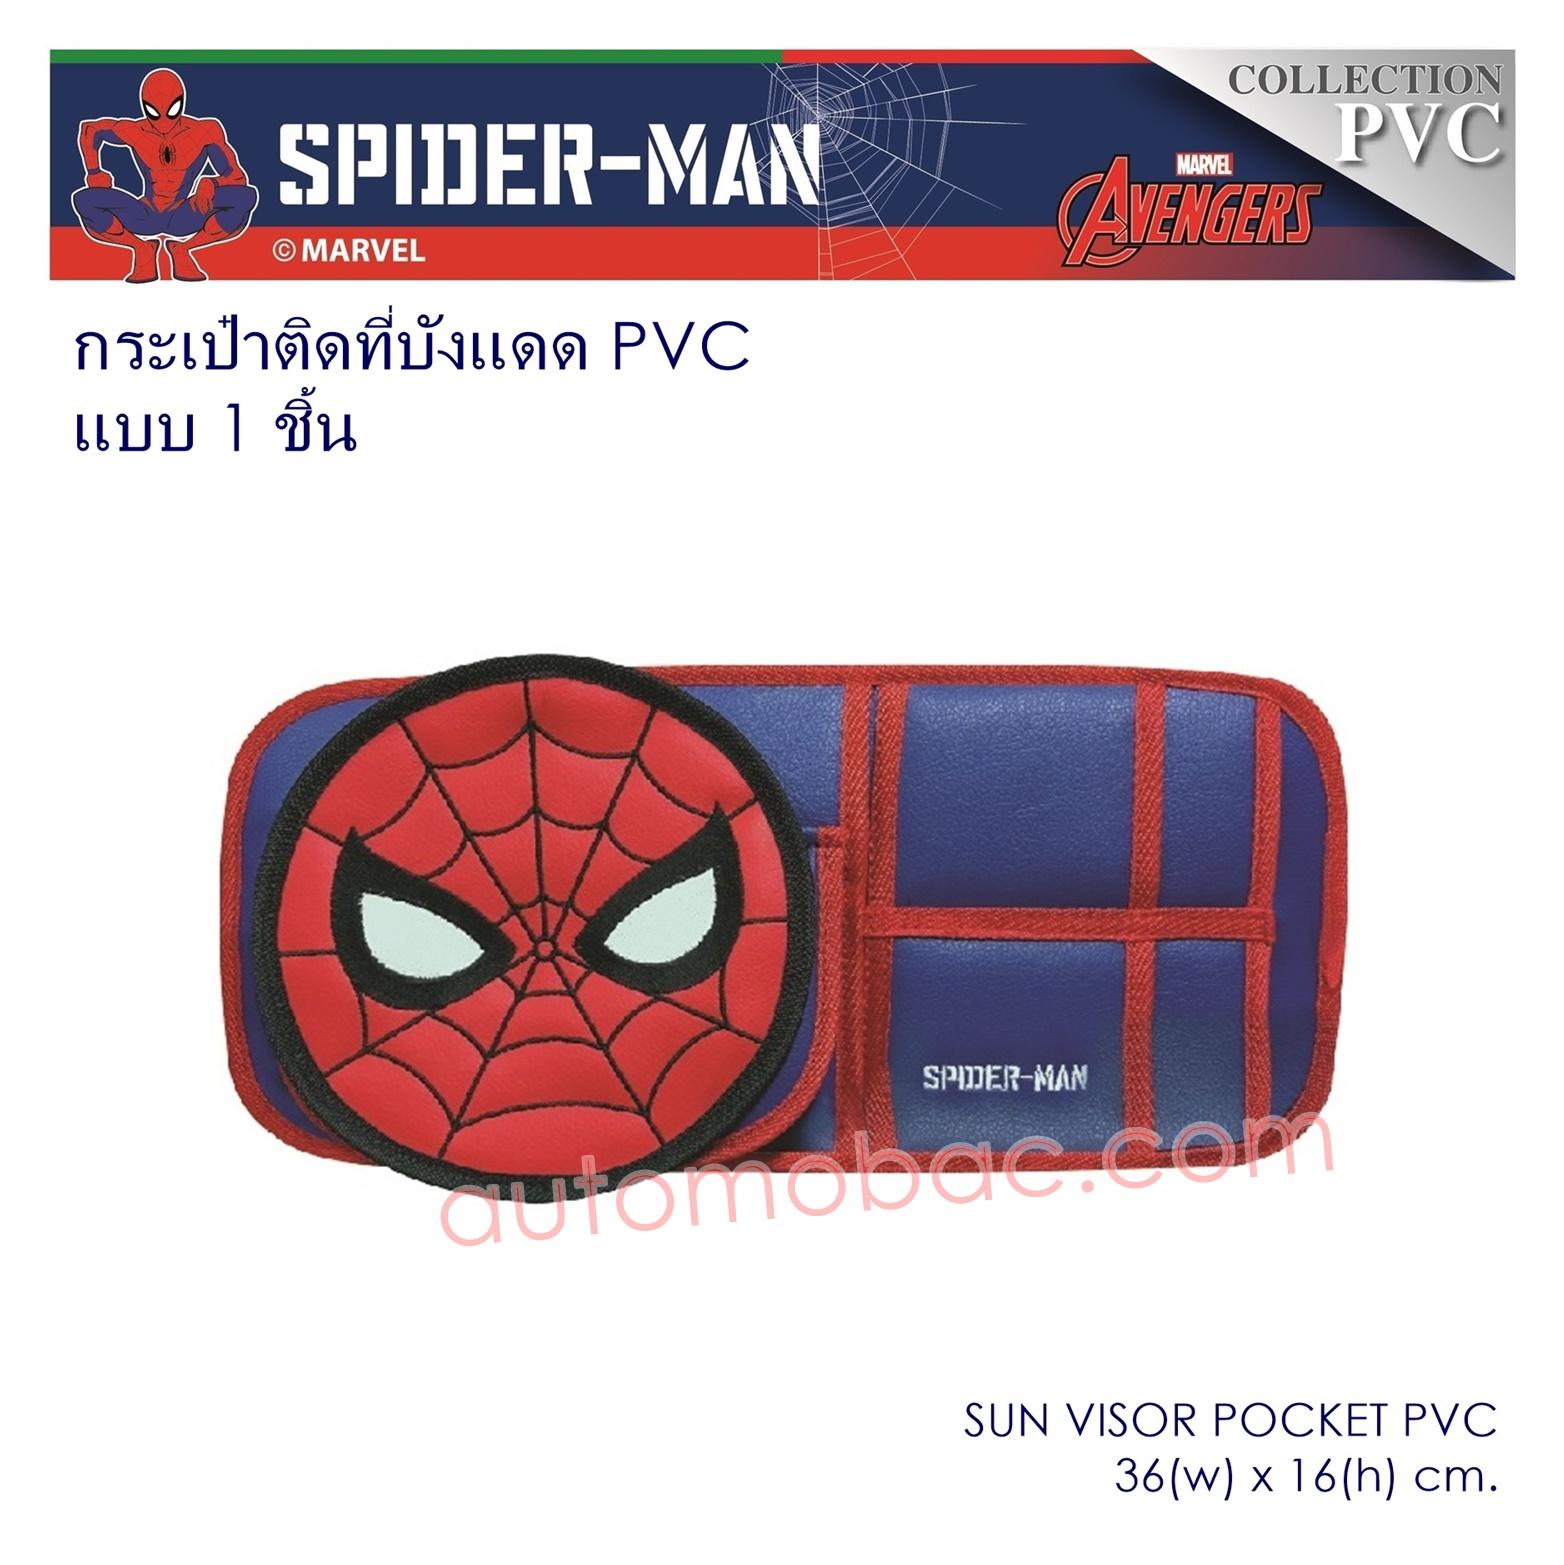 Spider-man กระเป๋าติดที่บังแดด 1 ชิ้น หนัง PVC ช่วยจัดระเบียบ หยิบใช้สะดวก ใส่นามบัตรได้